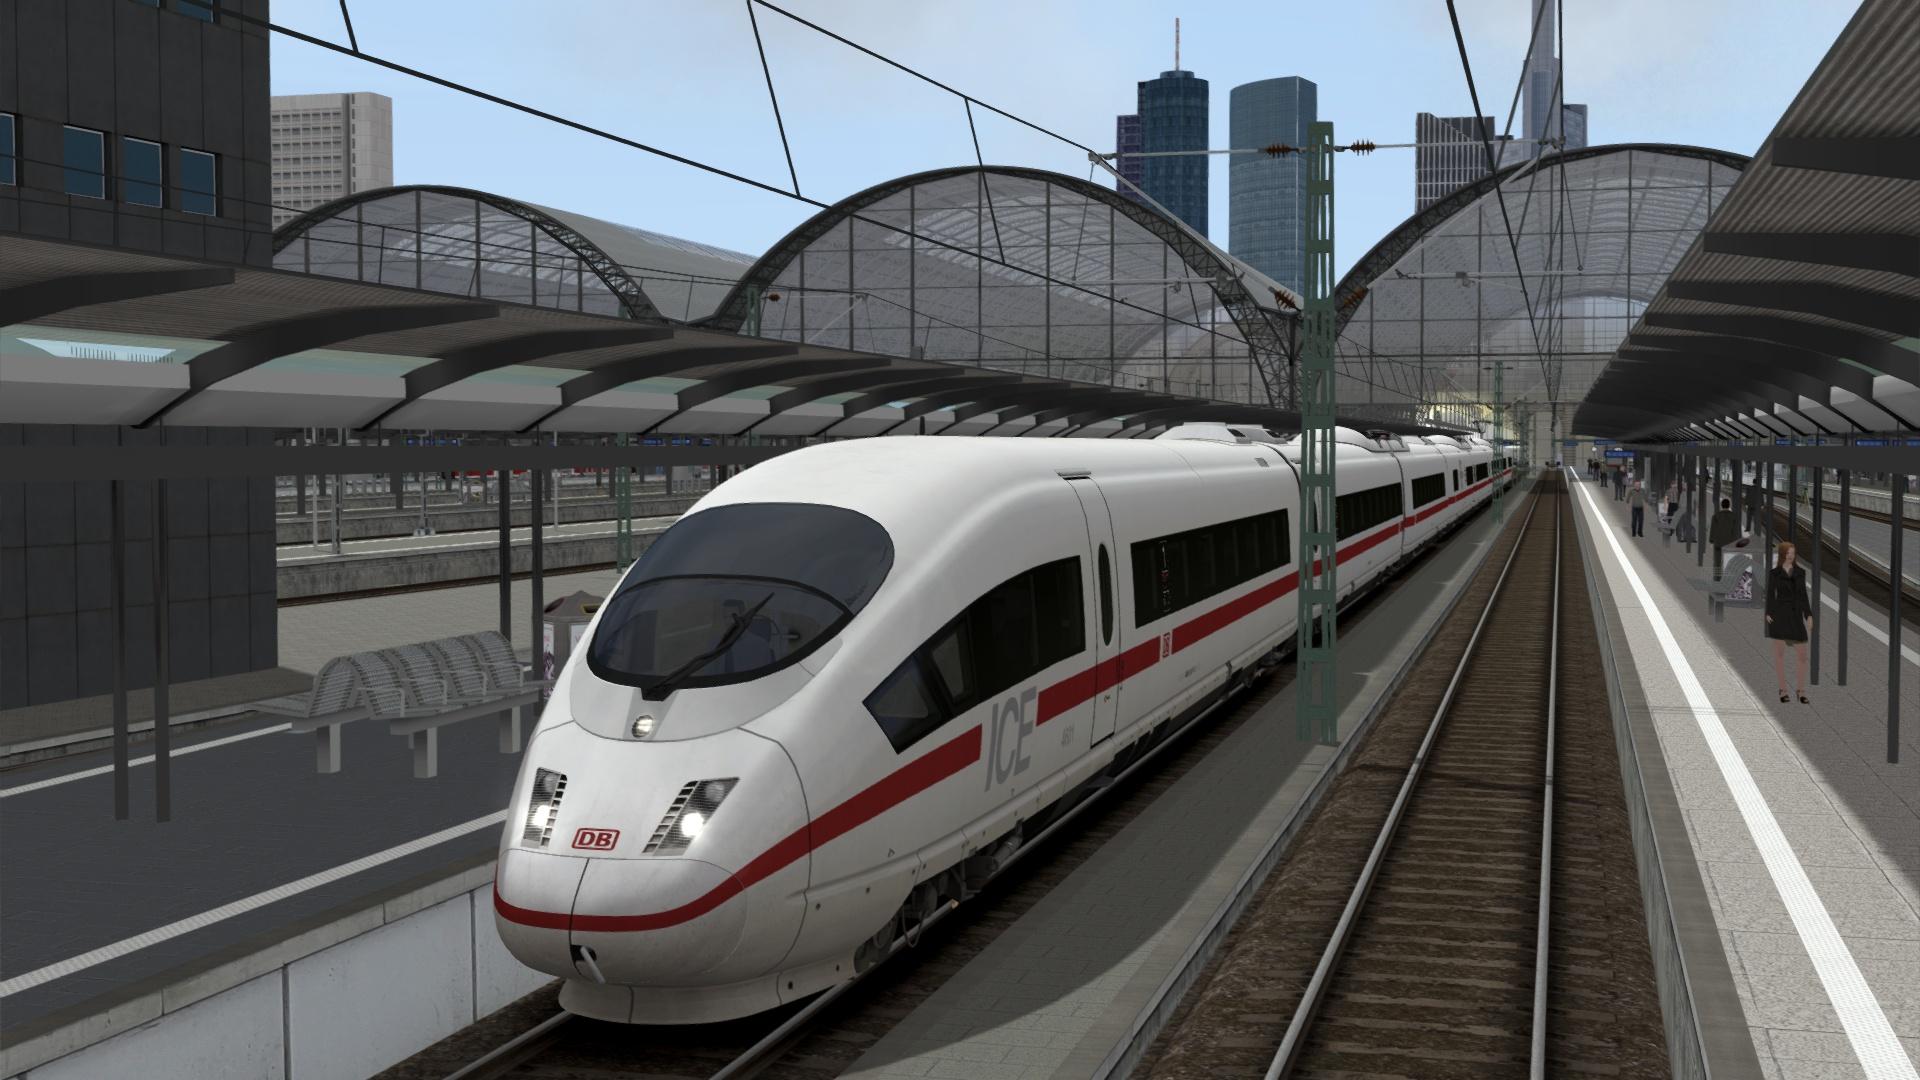 train simulator 2015 download tpb